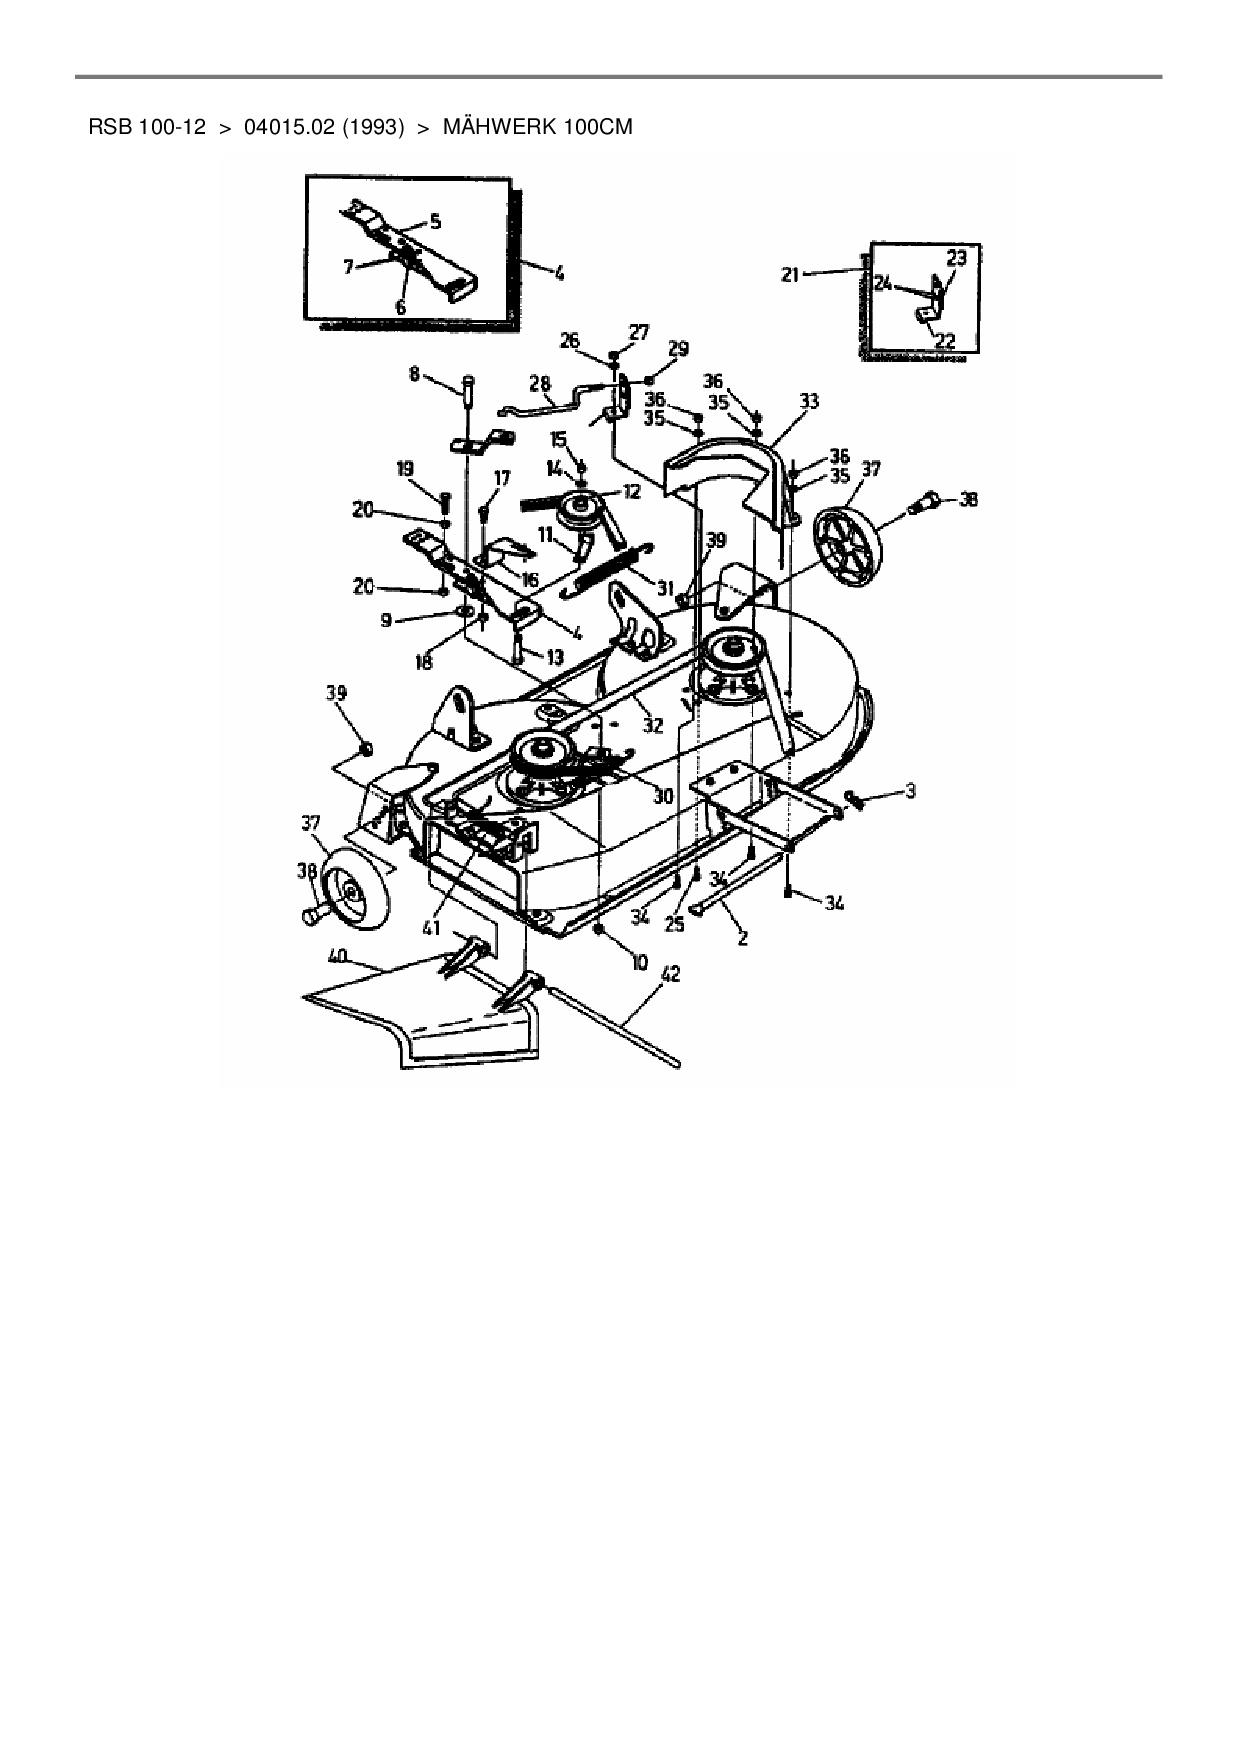 Fahrriemen Keilriemen passend Gutbrod RSB 100-12 Rasentraktor